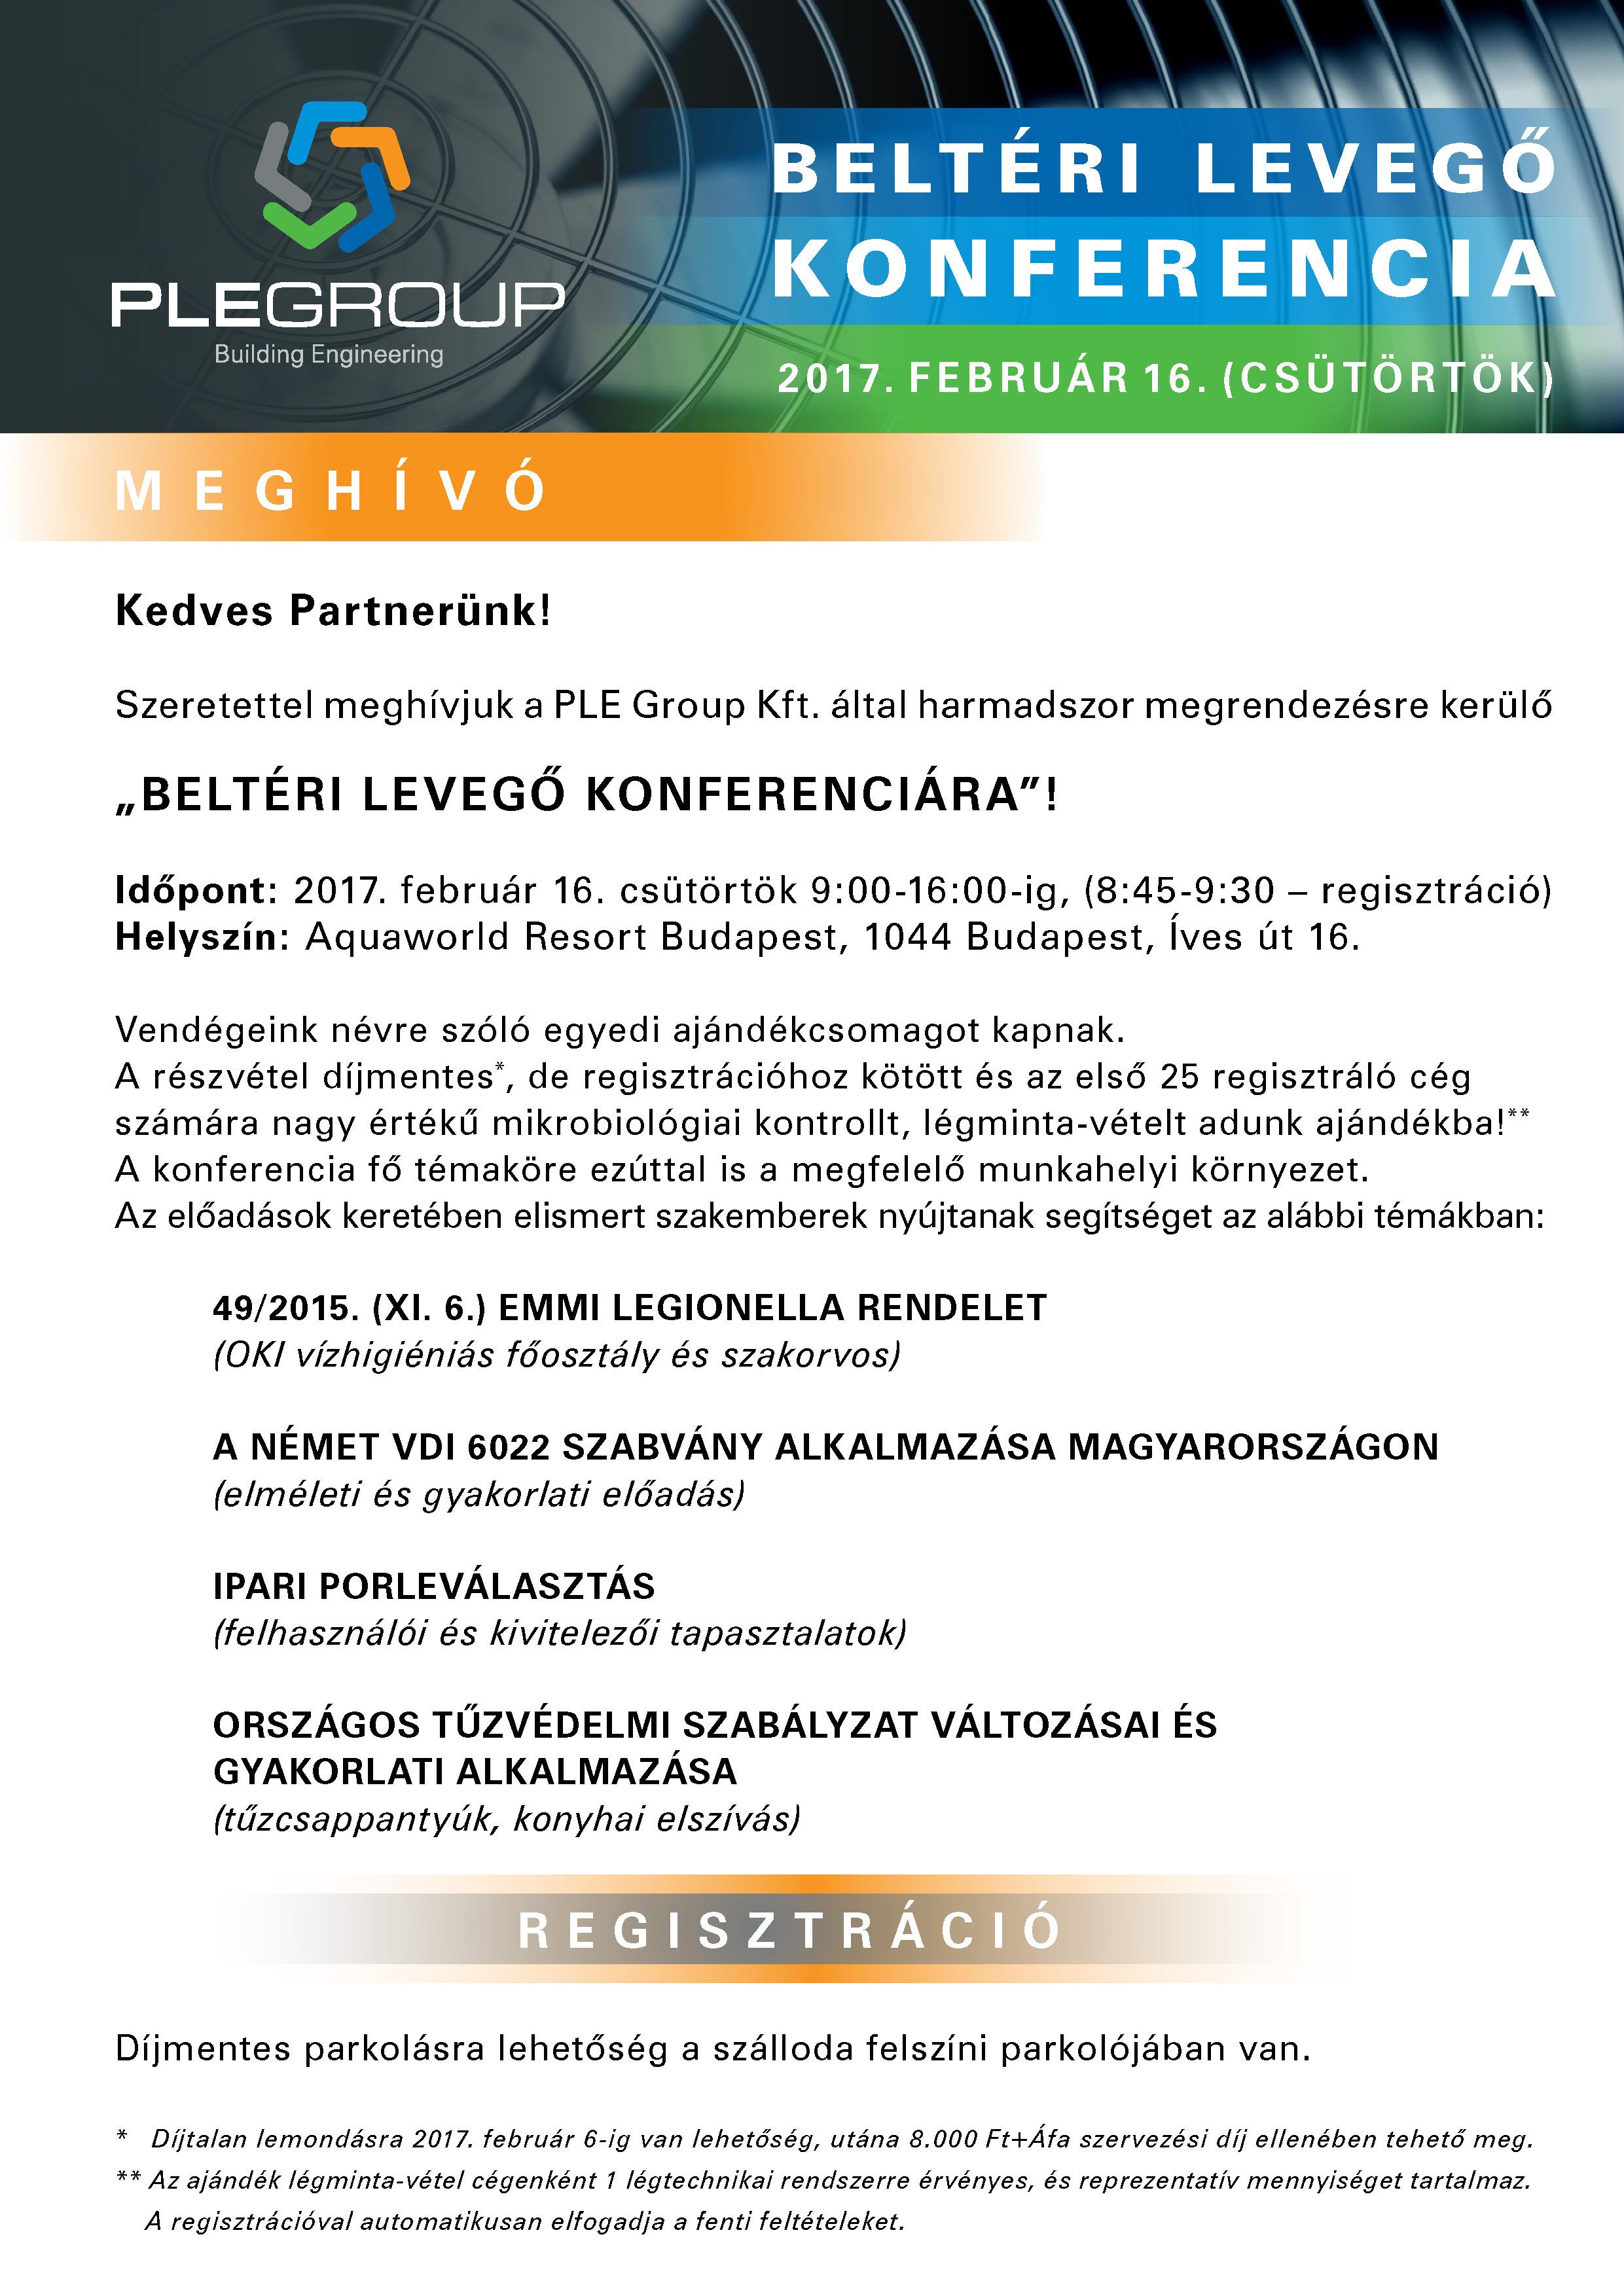 hirlevel_2017_konferencia_-1.jpg